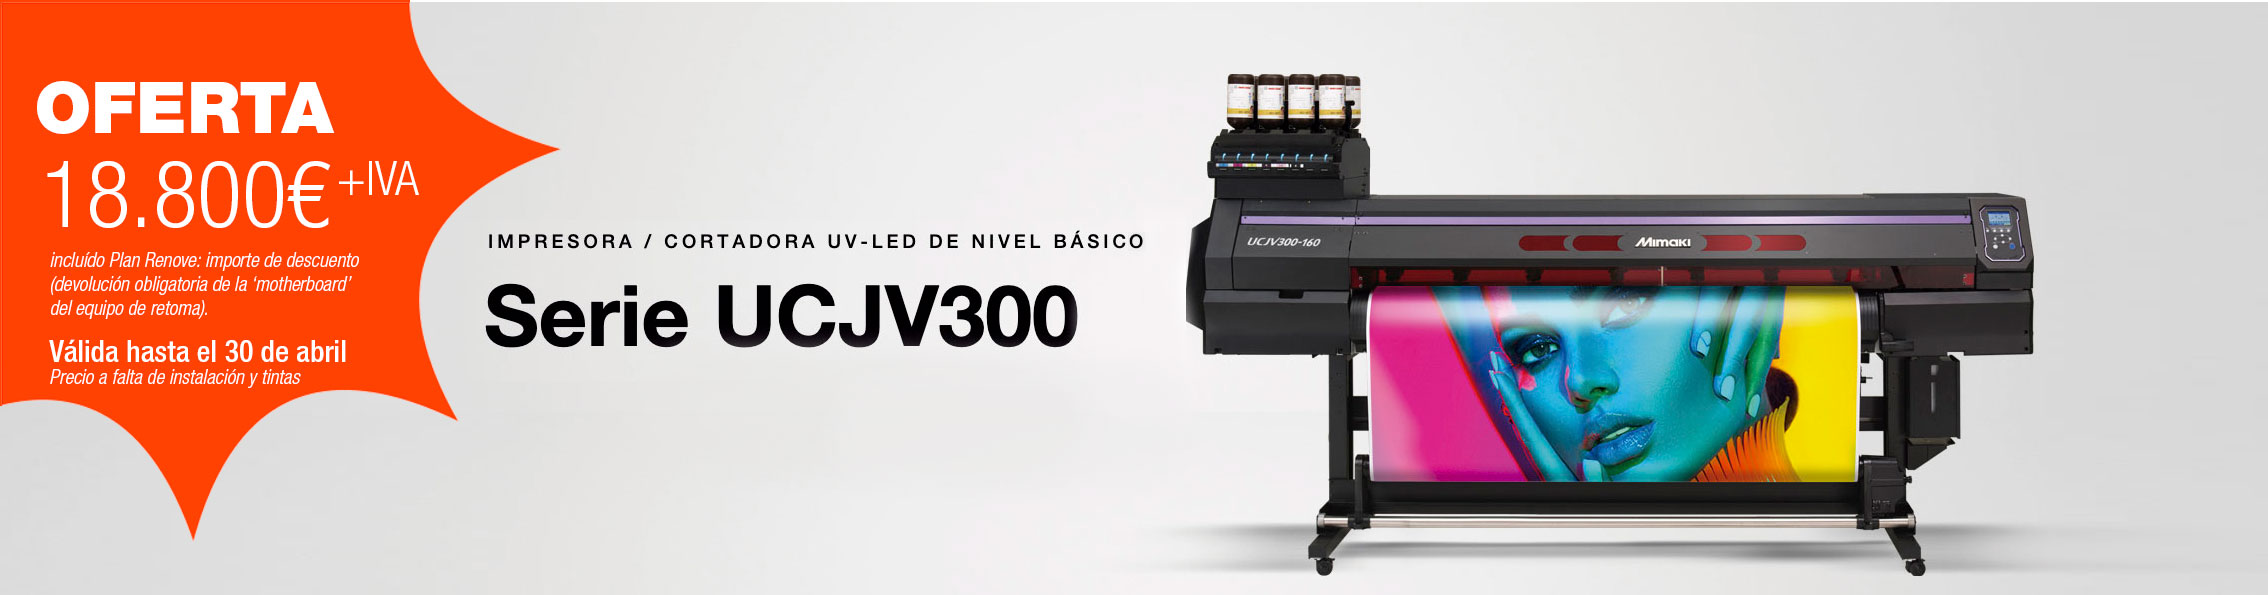 OFERTAS-UCJV300